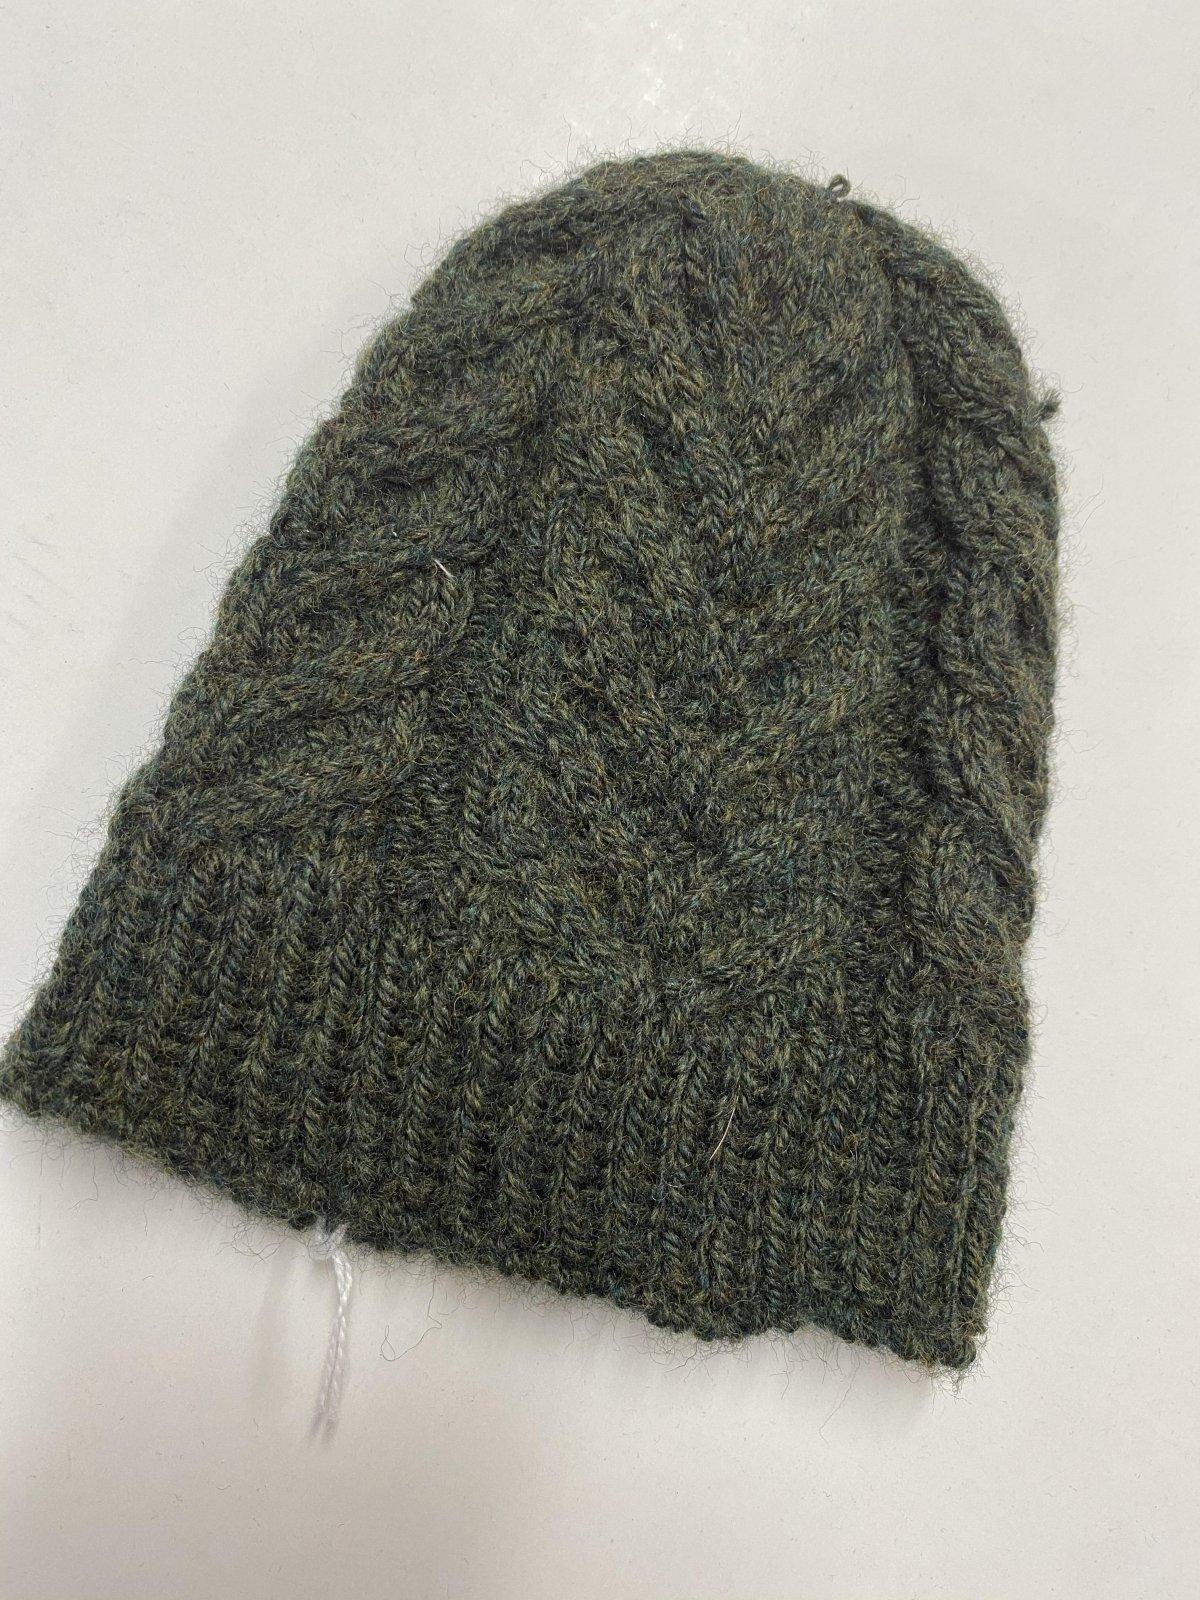 Sample Sale Knit/Crochet Items